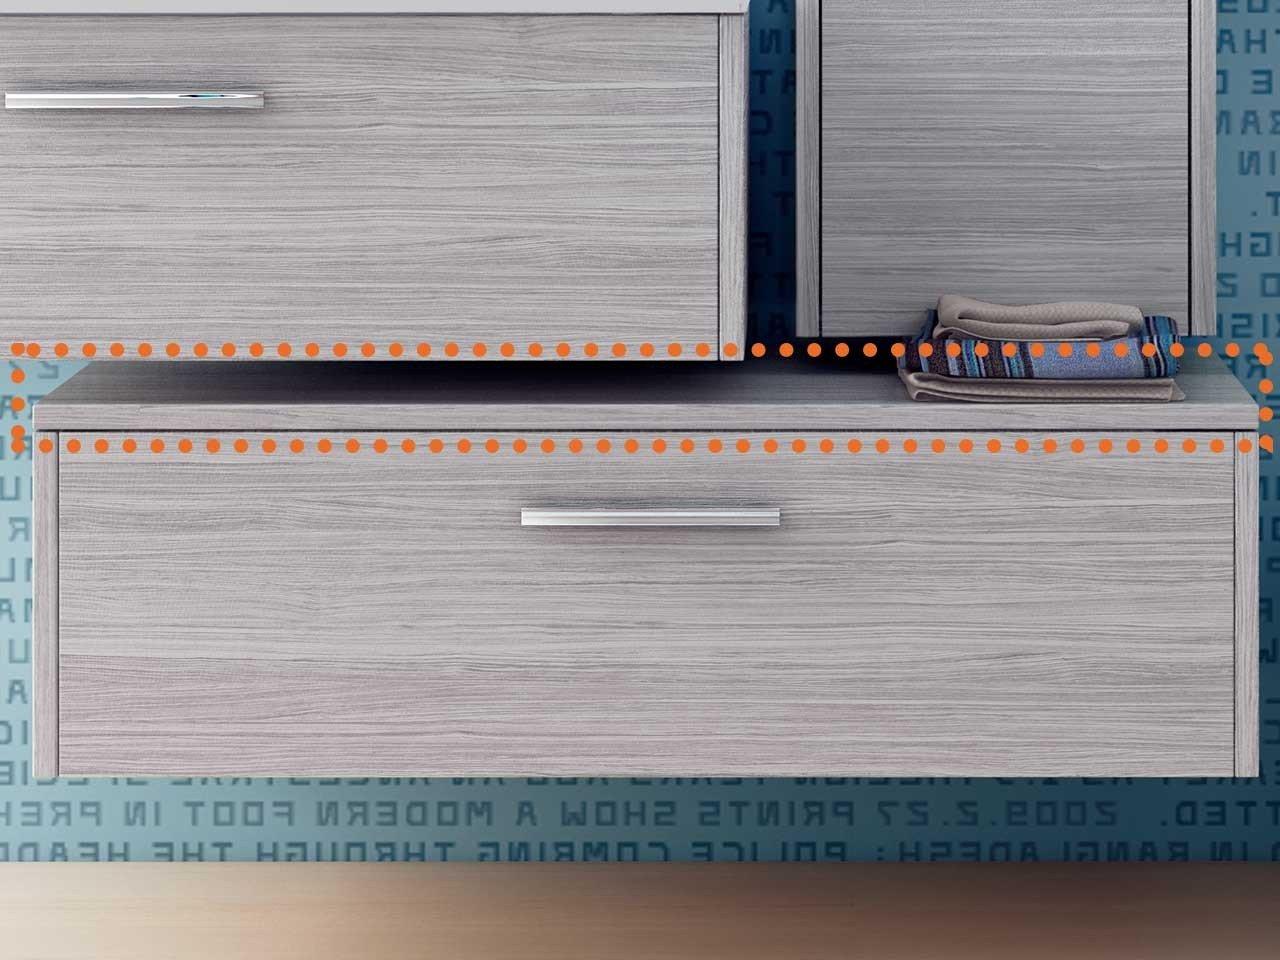 mobili moderni economici on line ~ dragtime for . - Arredo Bagno Offerte On Line